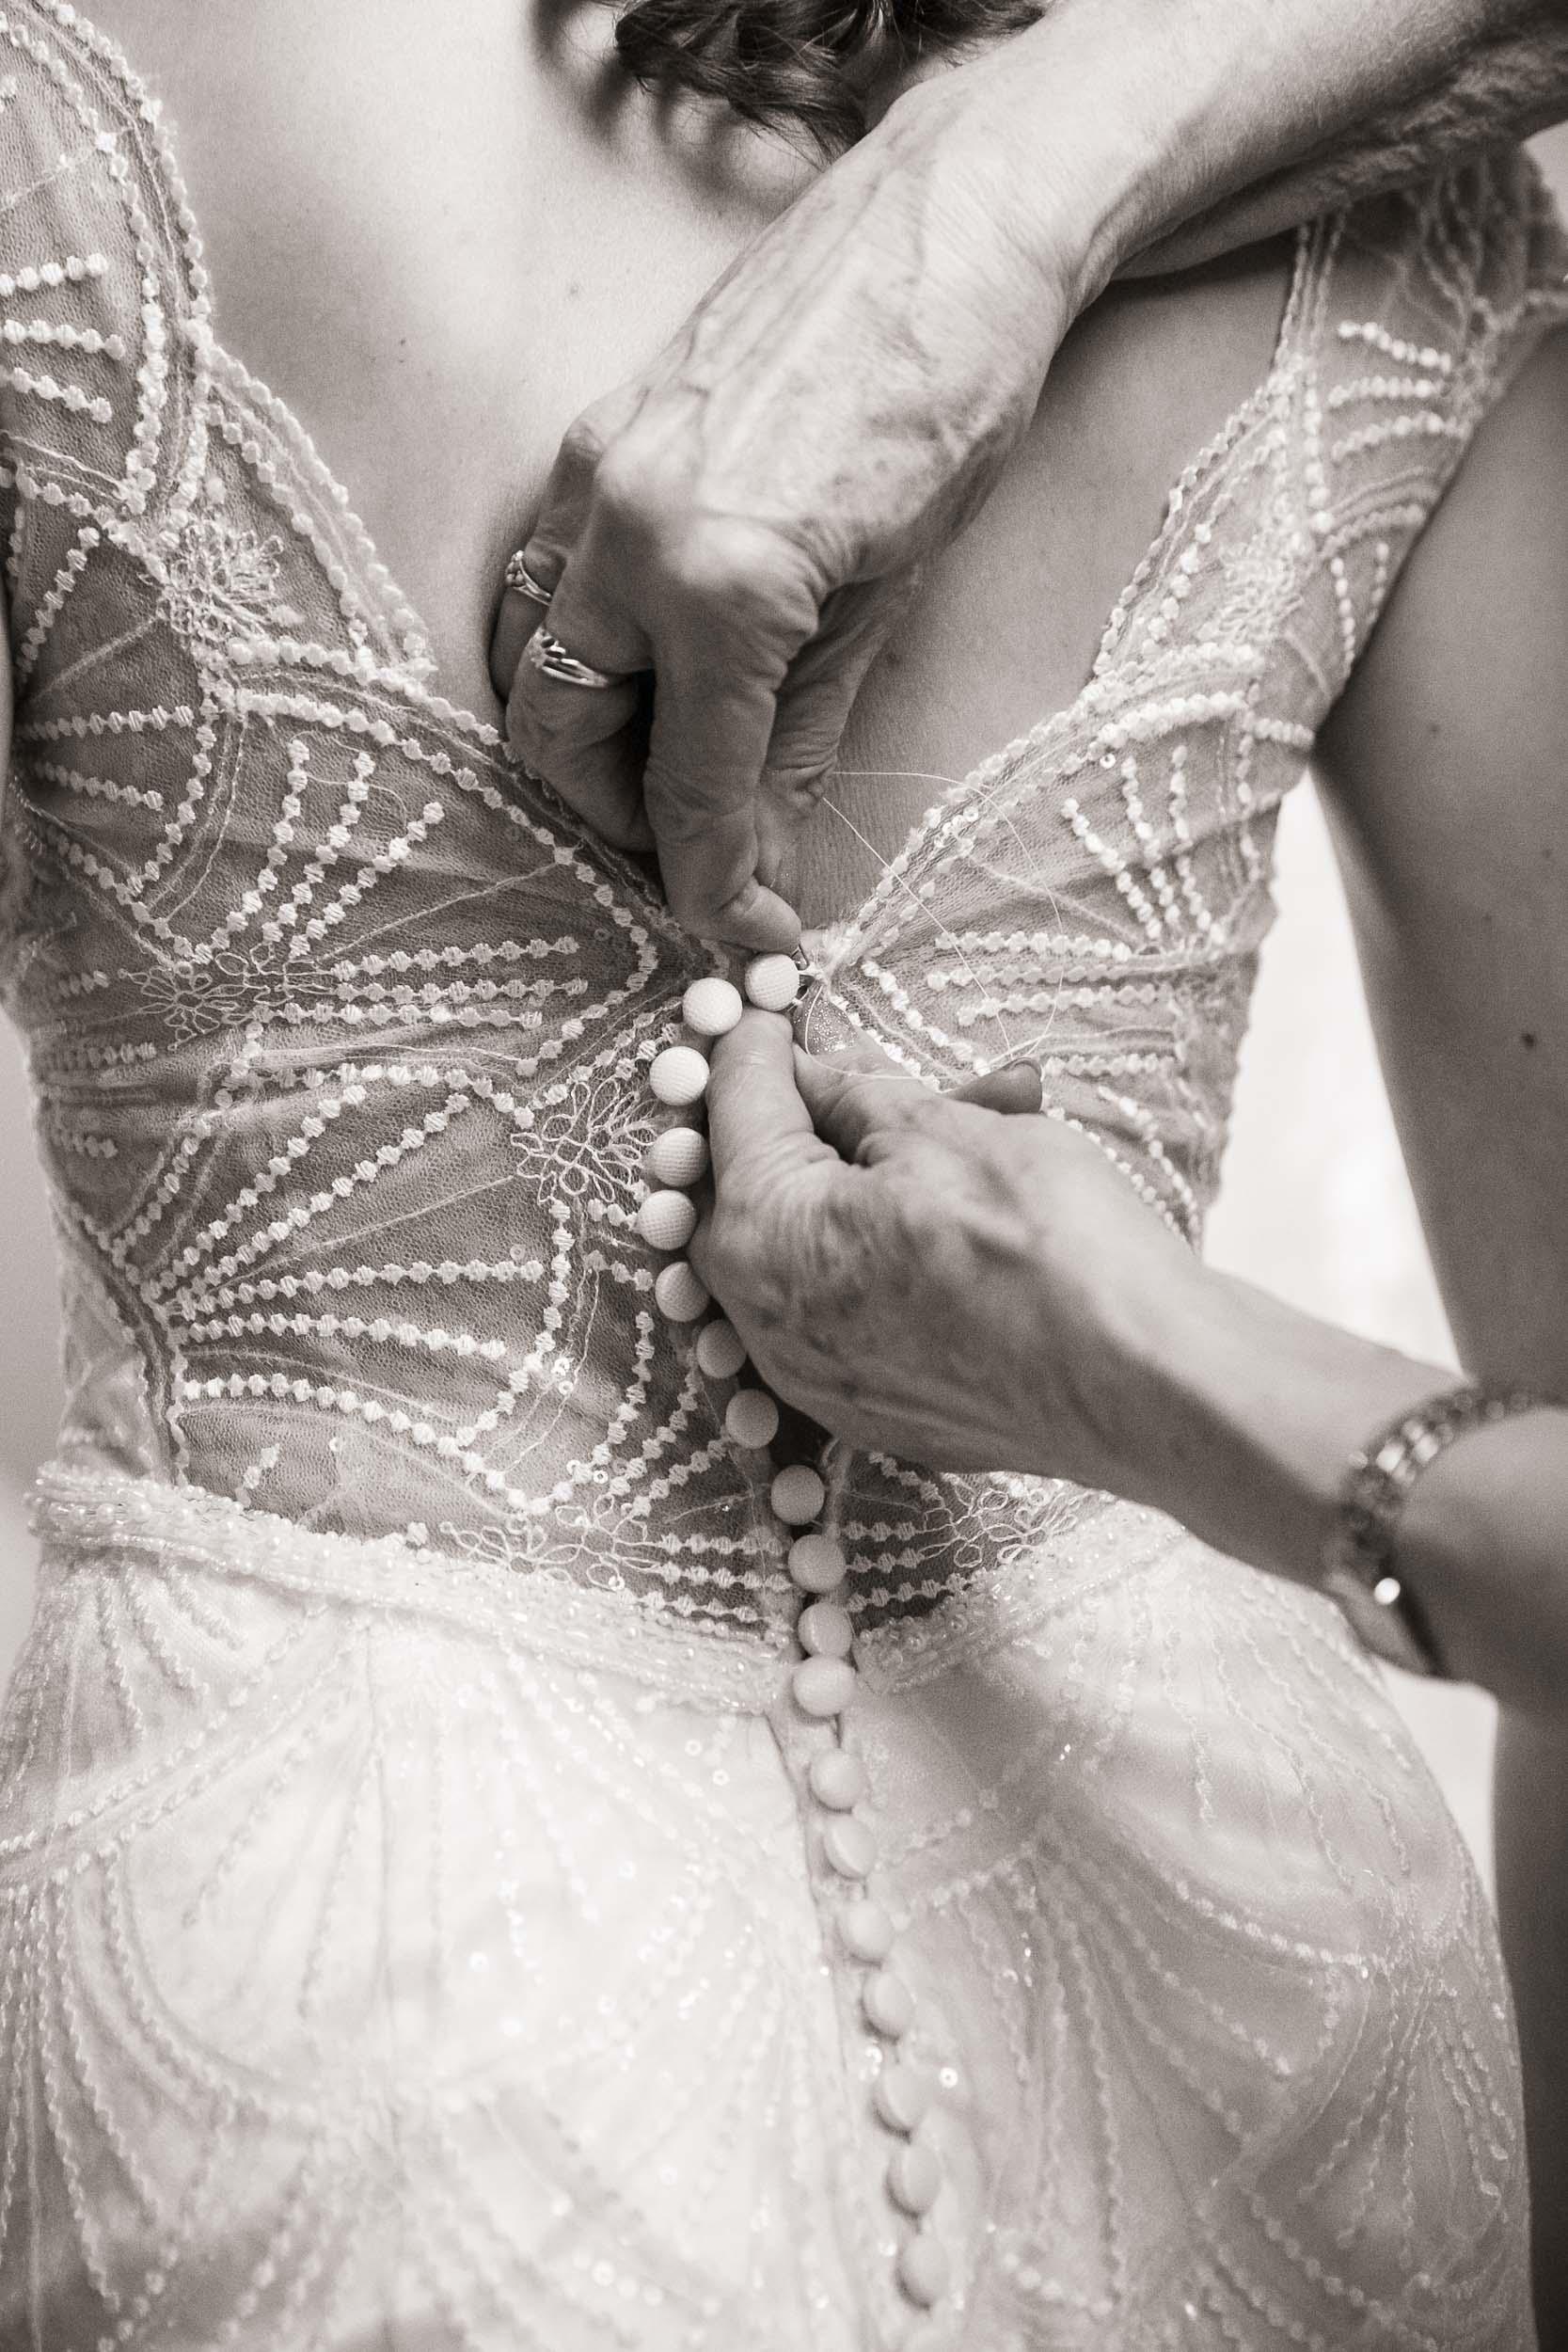 micklefield-hall-wedding-photographer 011.jpg